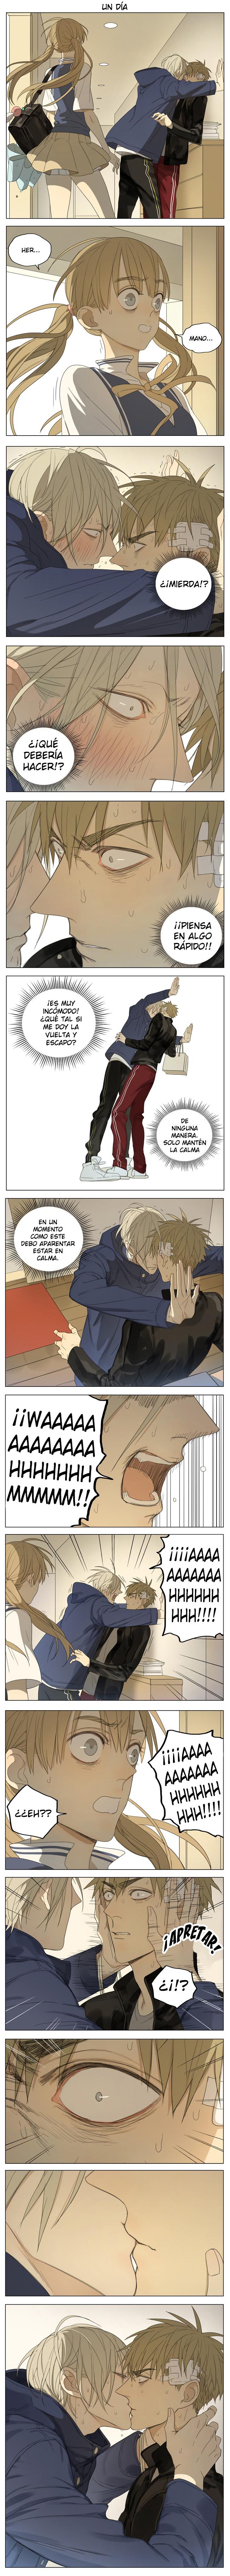 http://c5.ninemanga.com/es_manga/7/15943/435317/a41f781632ce686f2c7746208bf36912.jpg Page 2